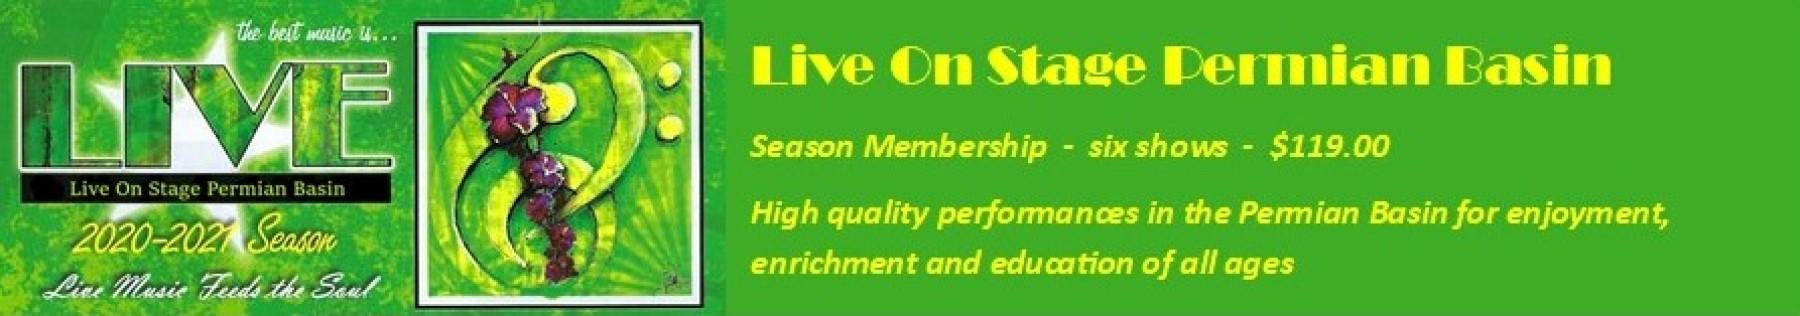 LiveonStage-PB.org